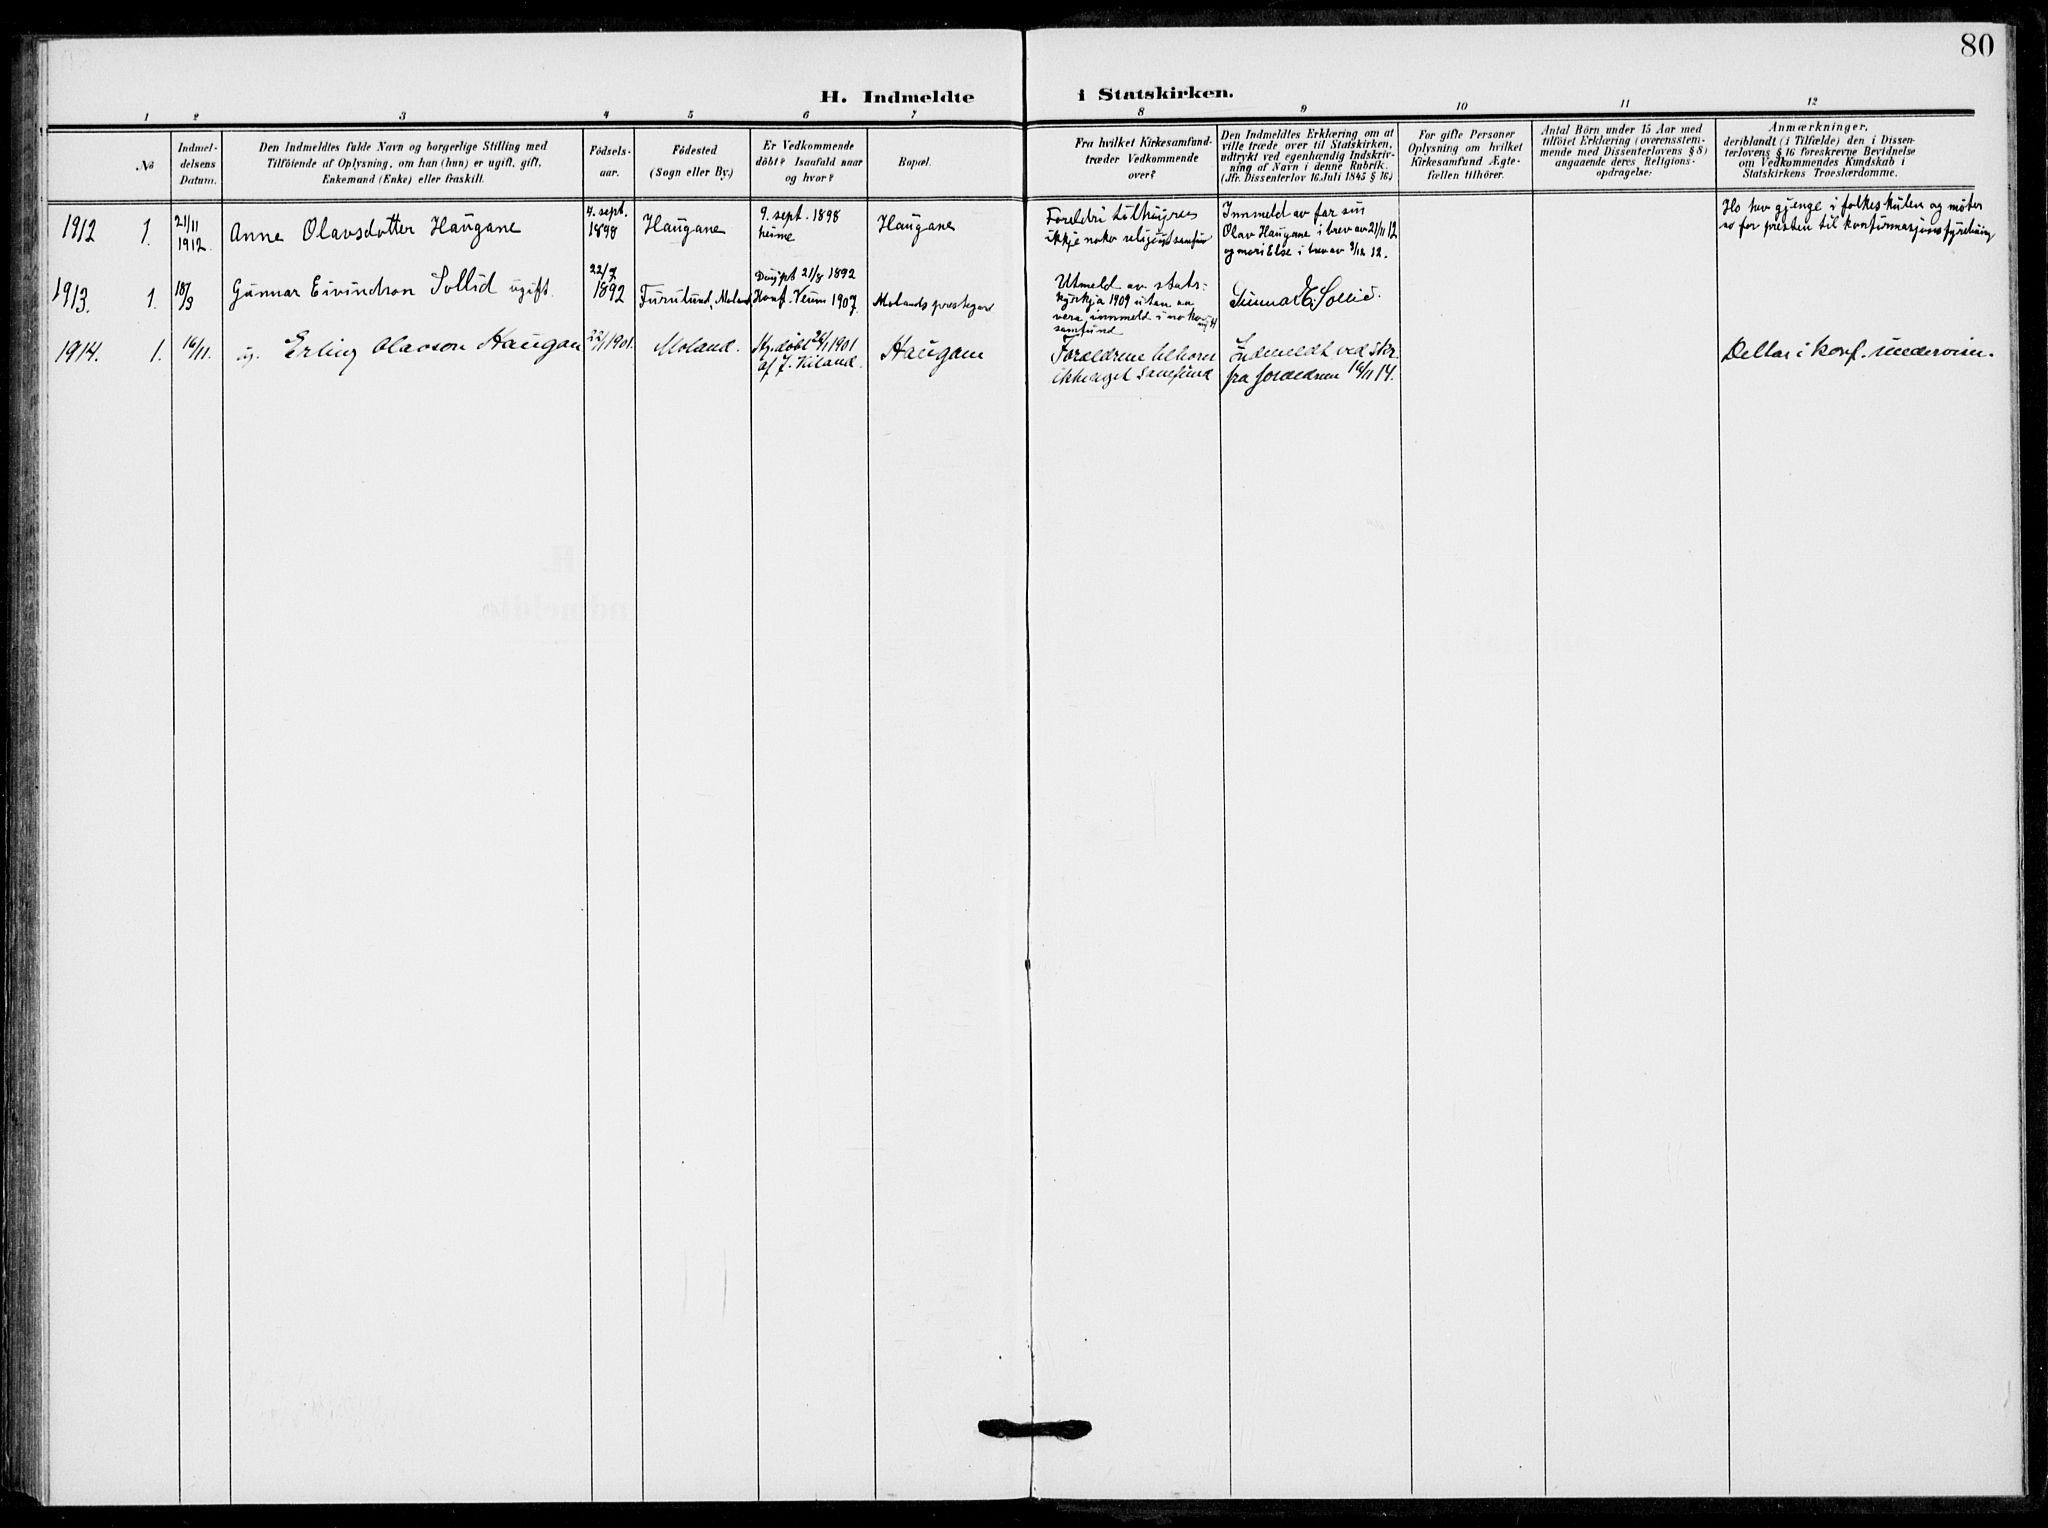 SAKO, Fyresdal kirkebøker, F/Fb/L0004: Ministerialbok nr. II 4, 1903-1920, s. 80